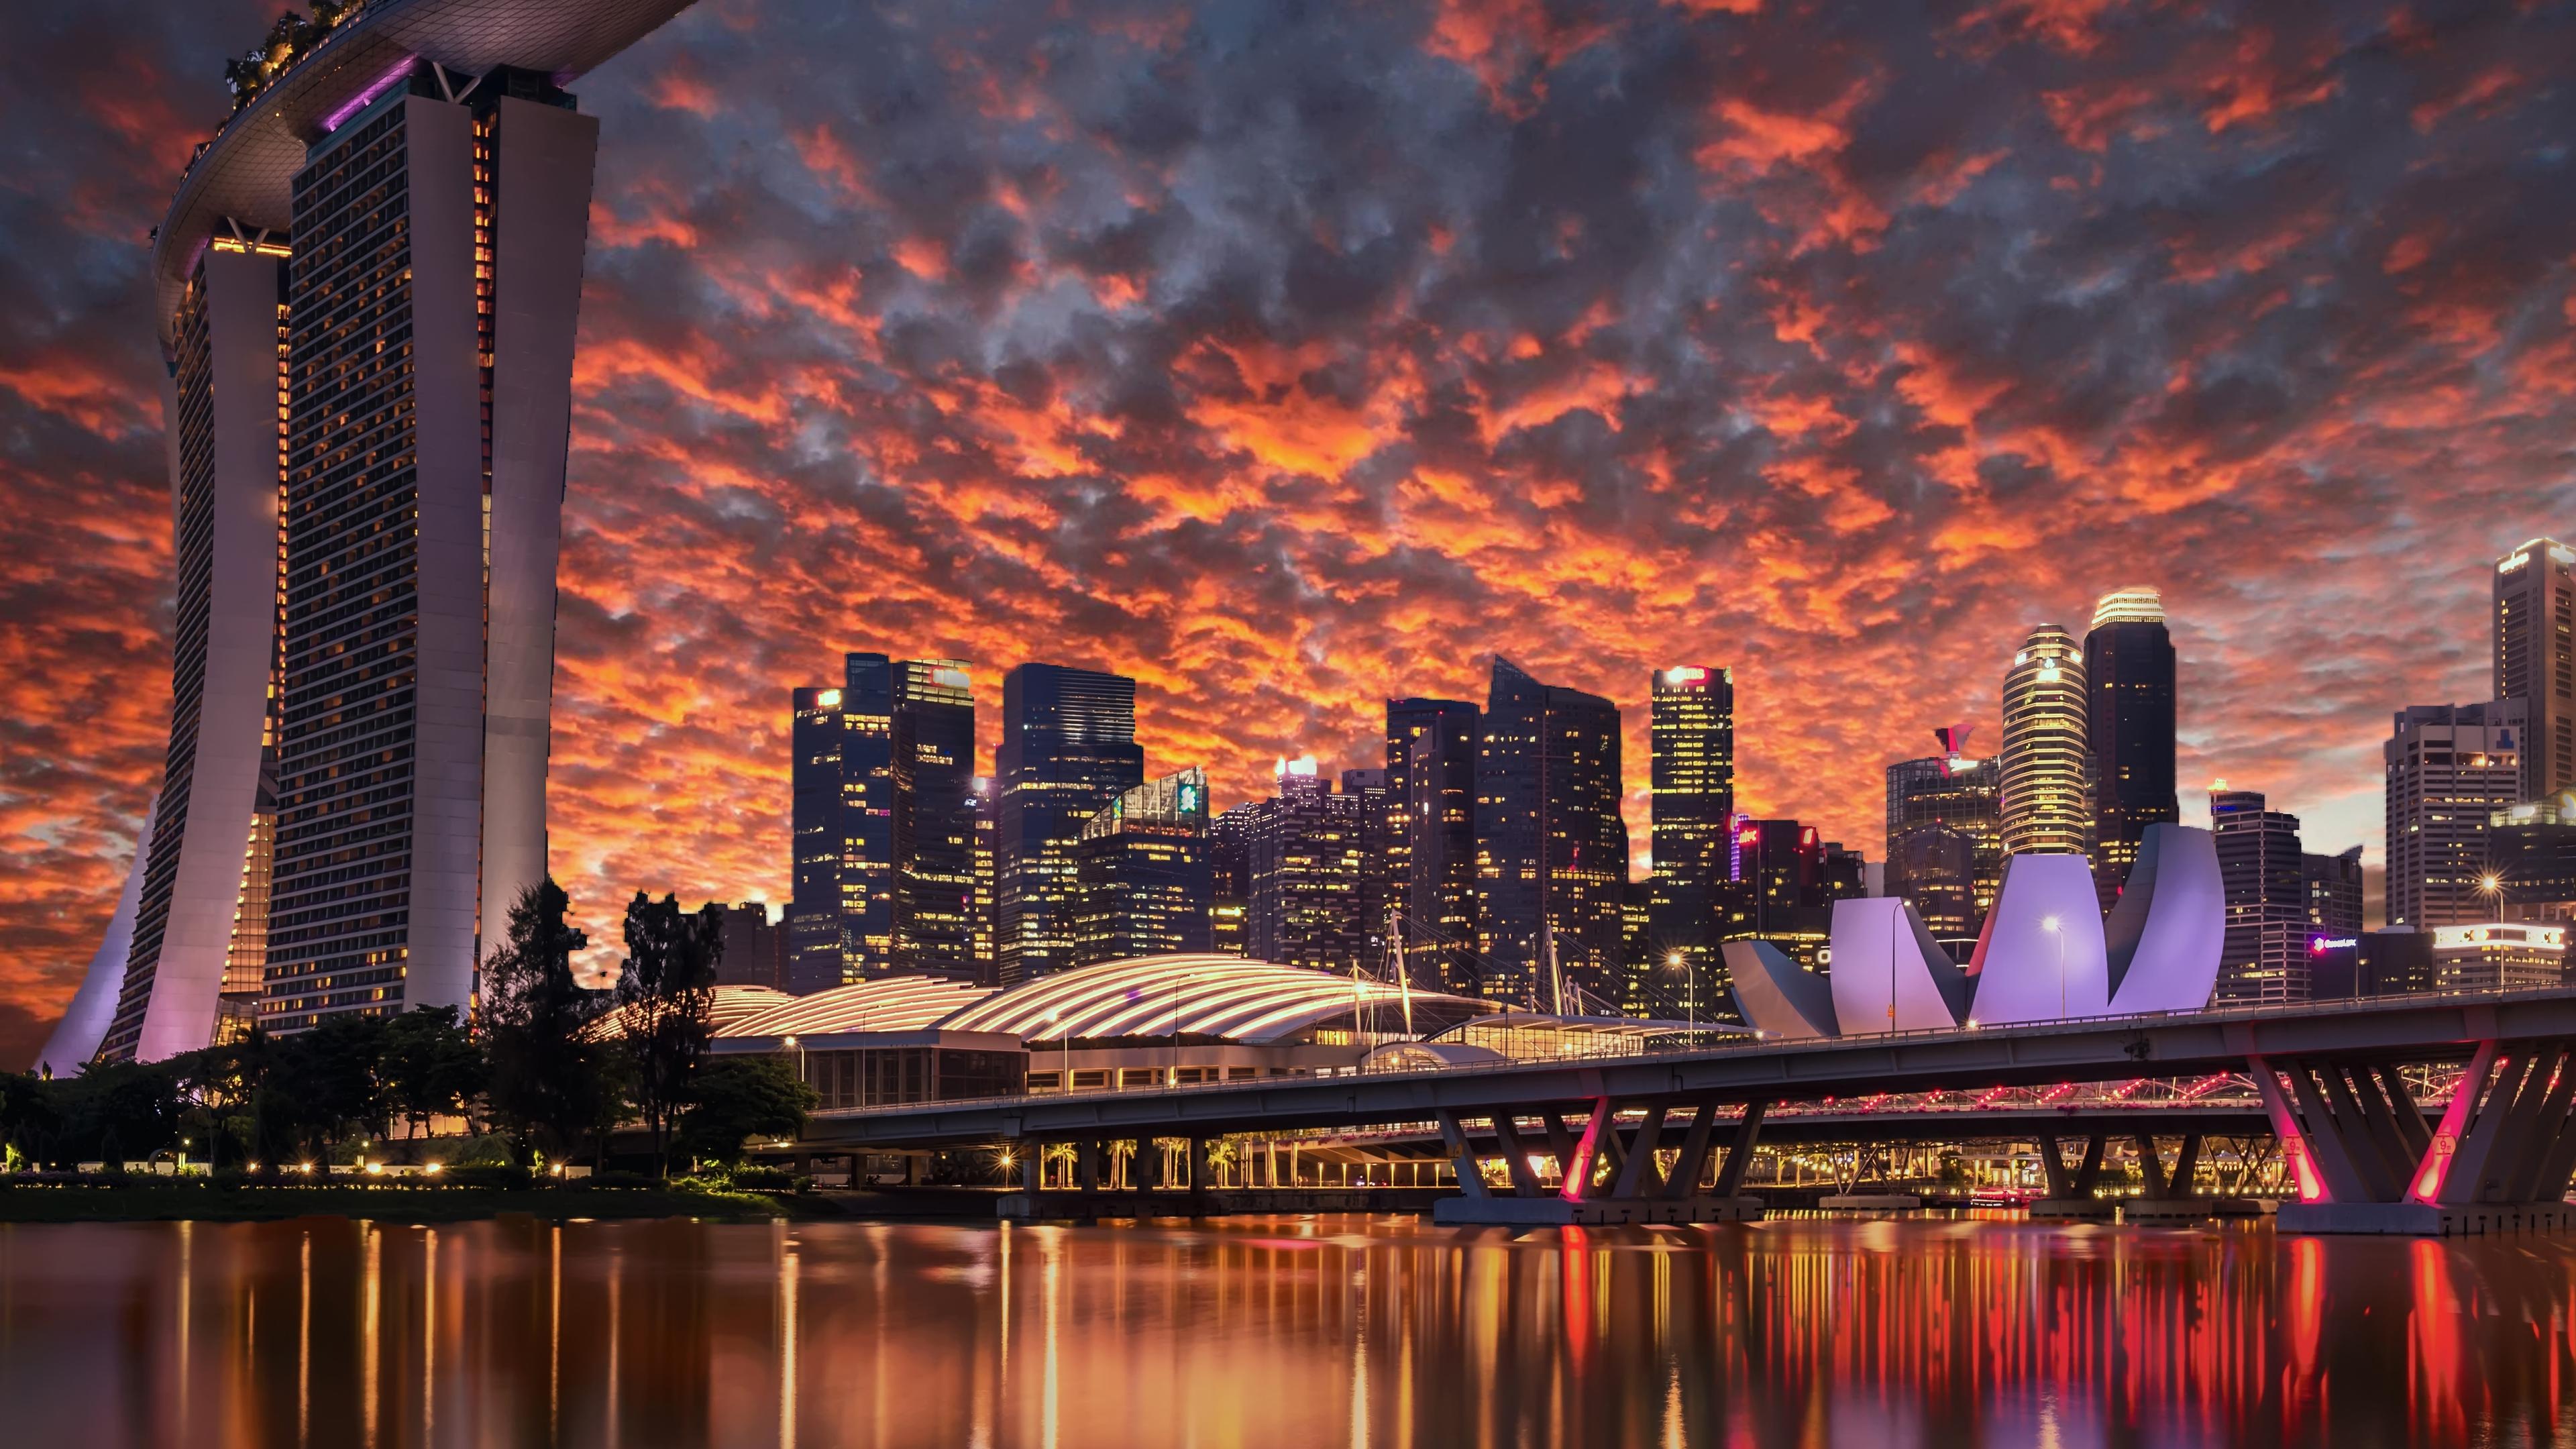 singapore skyscrapers marina bay sands evening 1569187783 - Singapore Skyscrapers Marina Bay Sands Evening - world wallpapers, singapore wallpapers, hd-wallpapers, city wallpapers, 4k-wallpapers